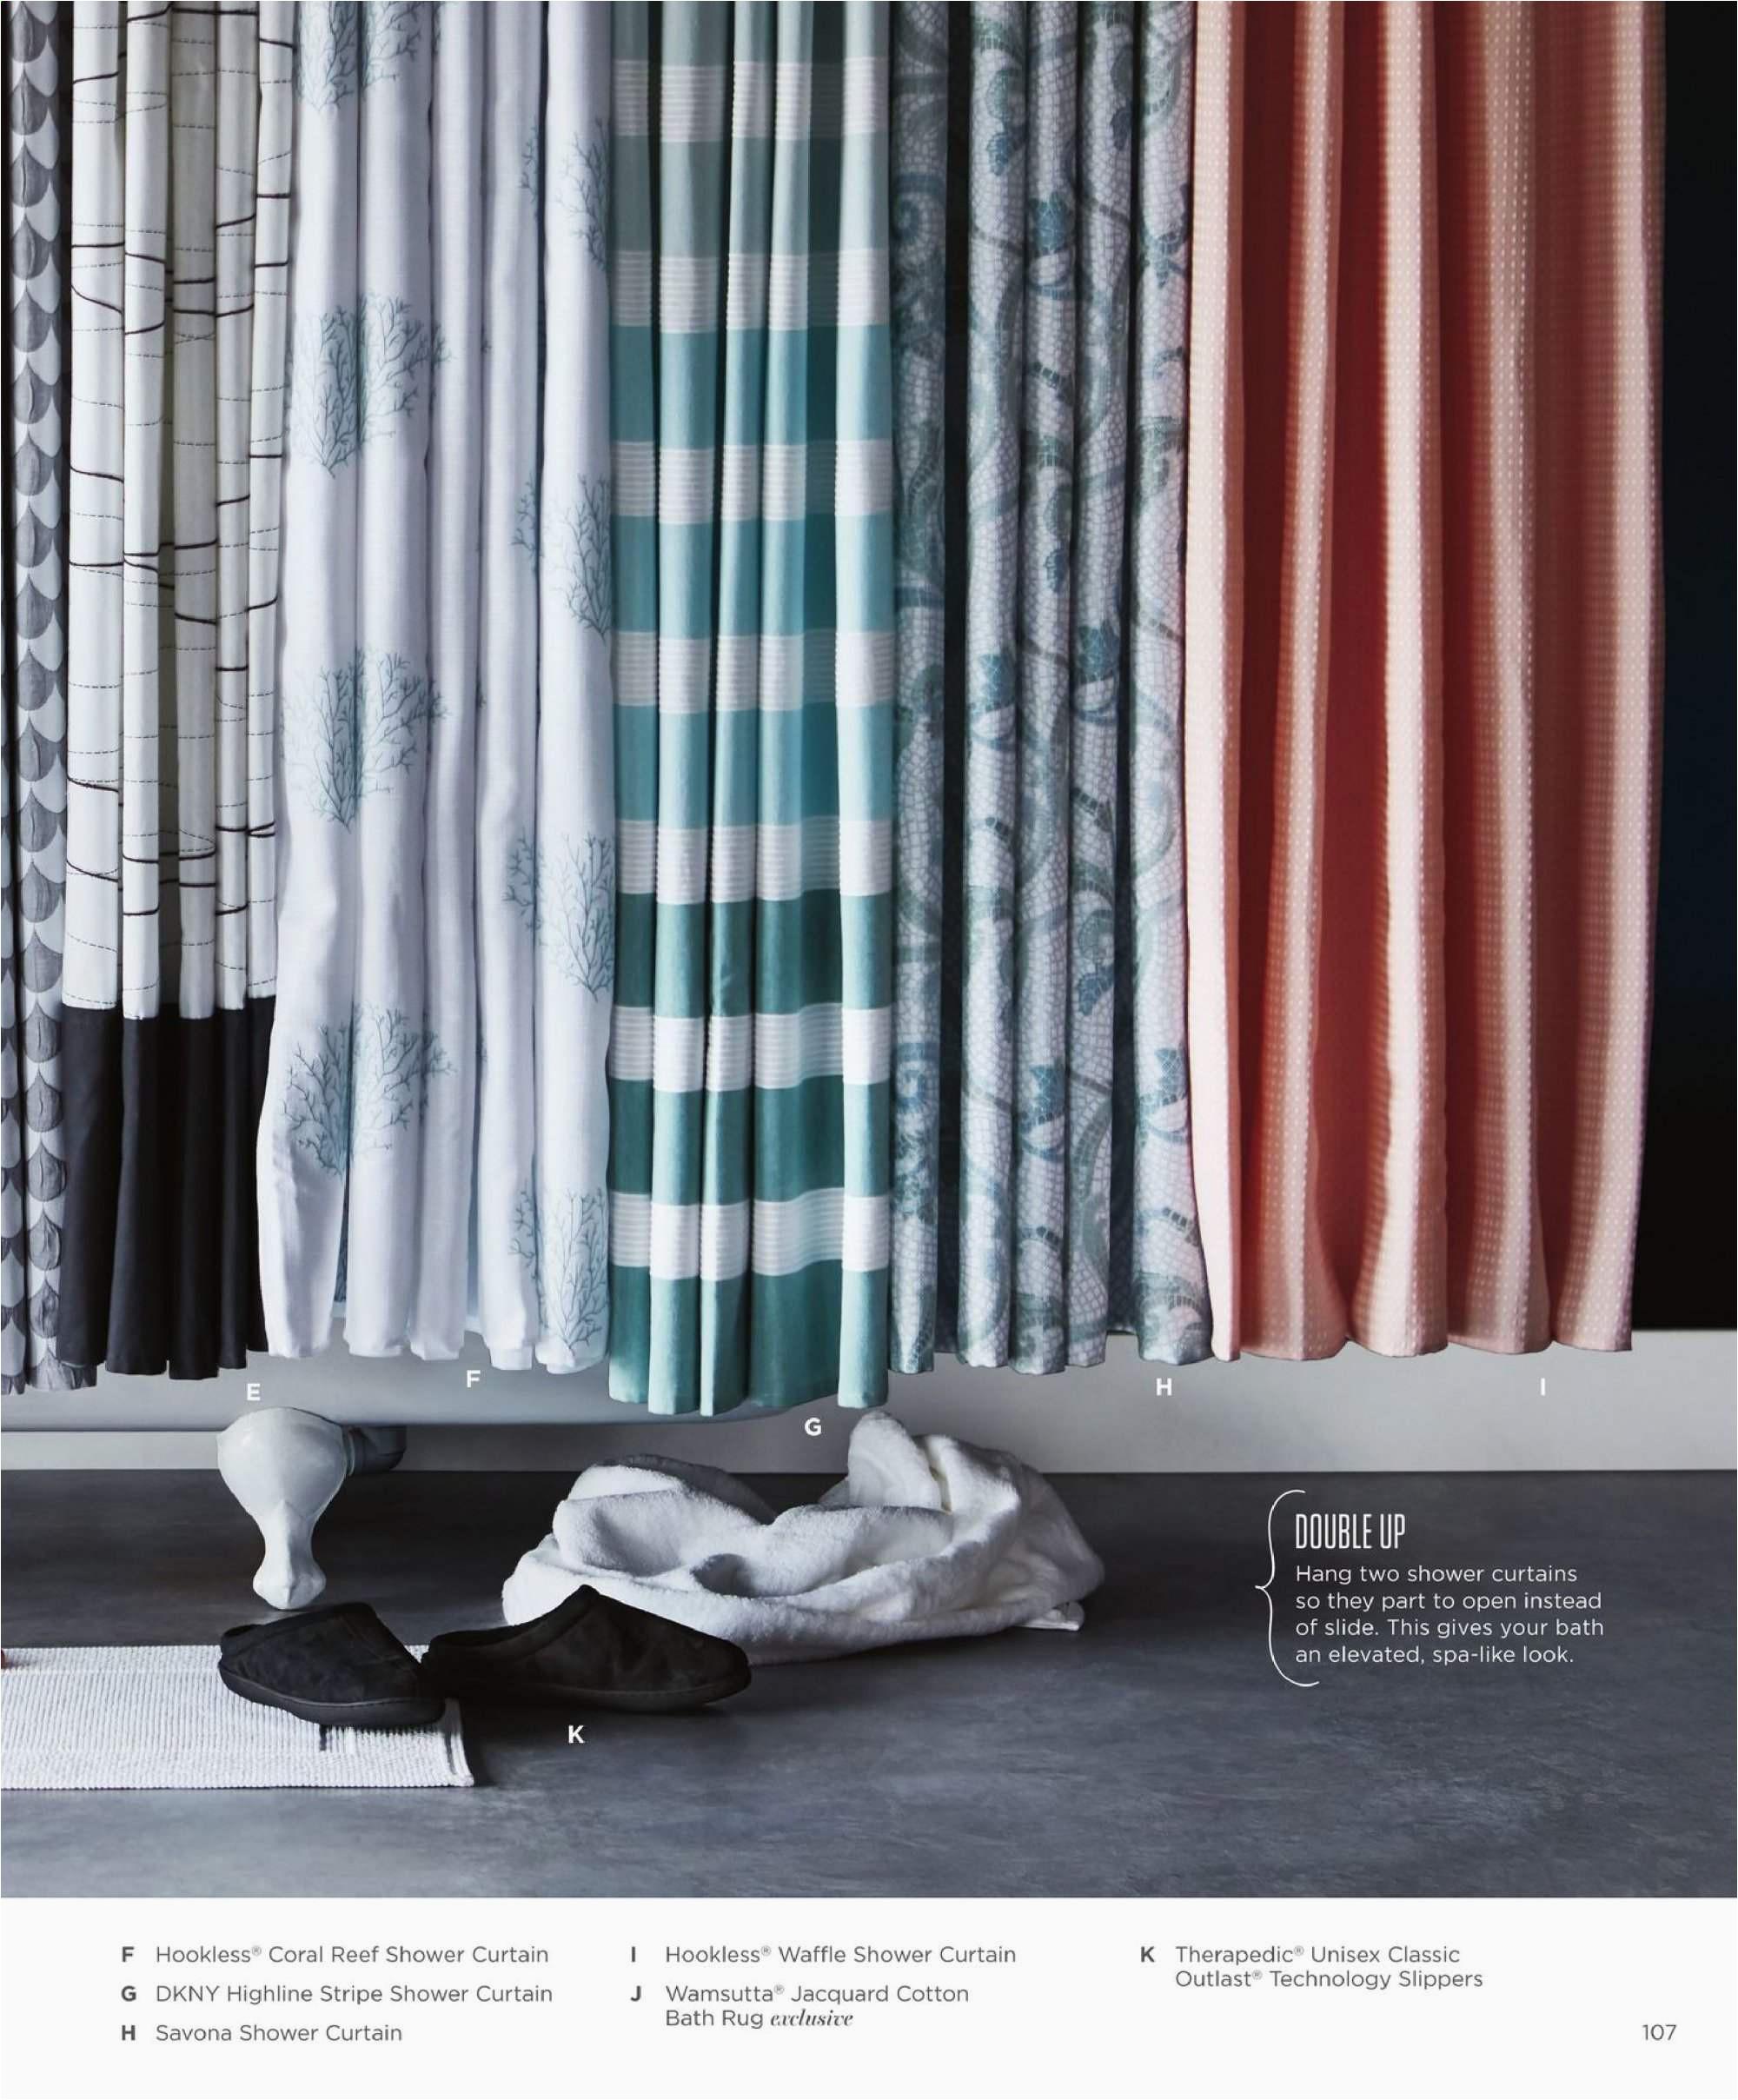 Dkny Highline Stripe Bath Rug Bed Bath & Beyond Flyer 03 09 2019 02 15 2020